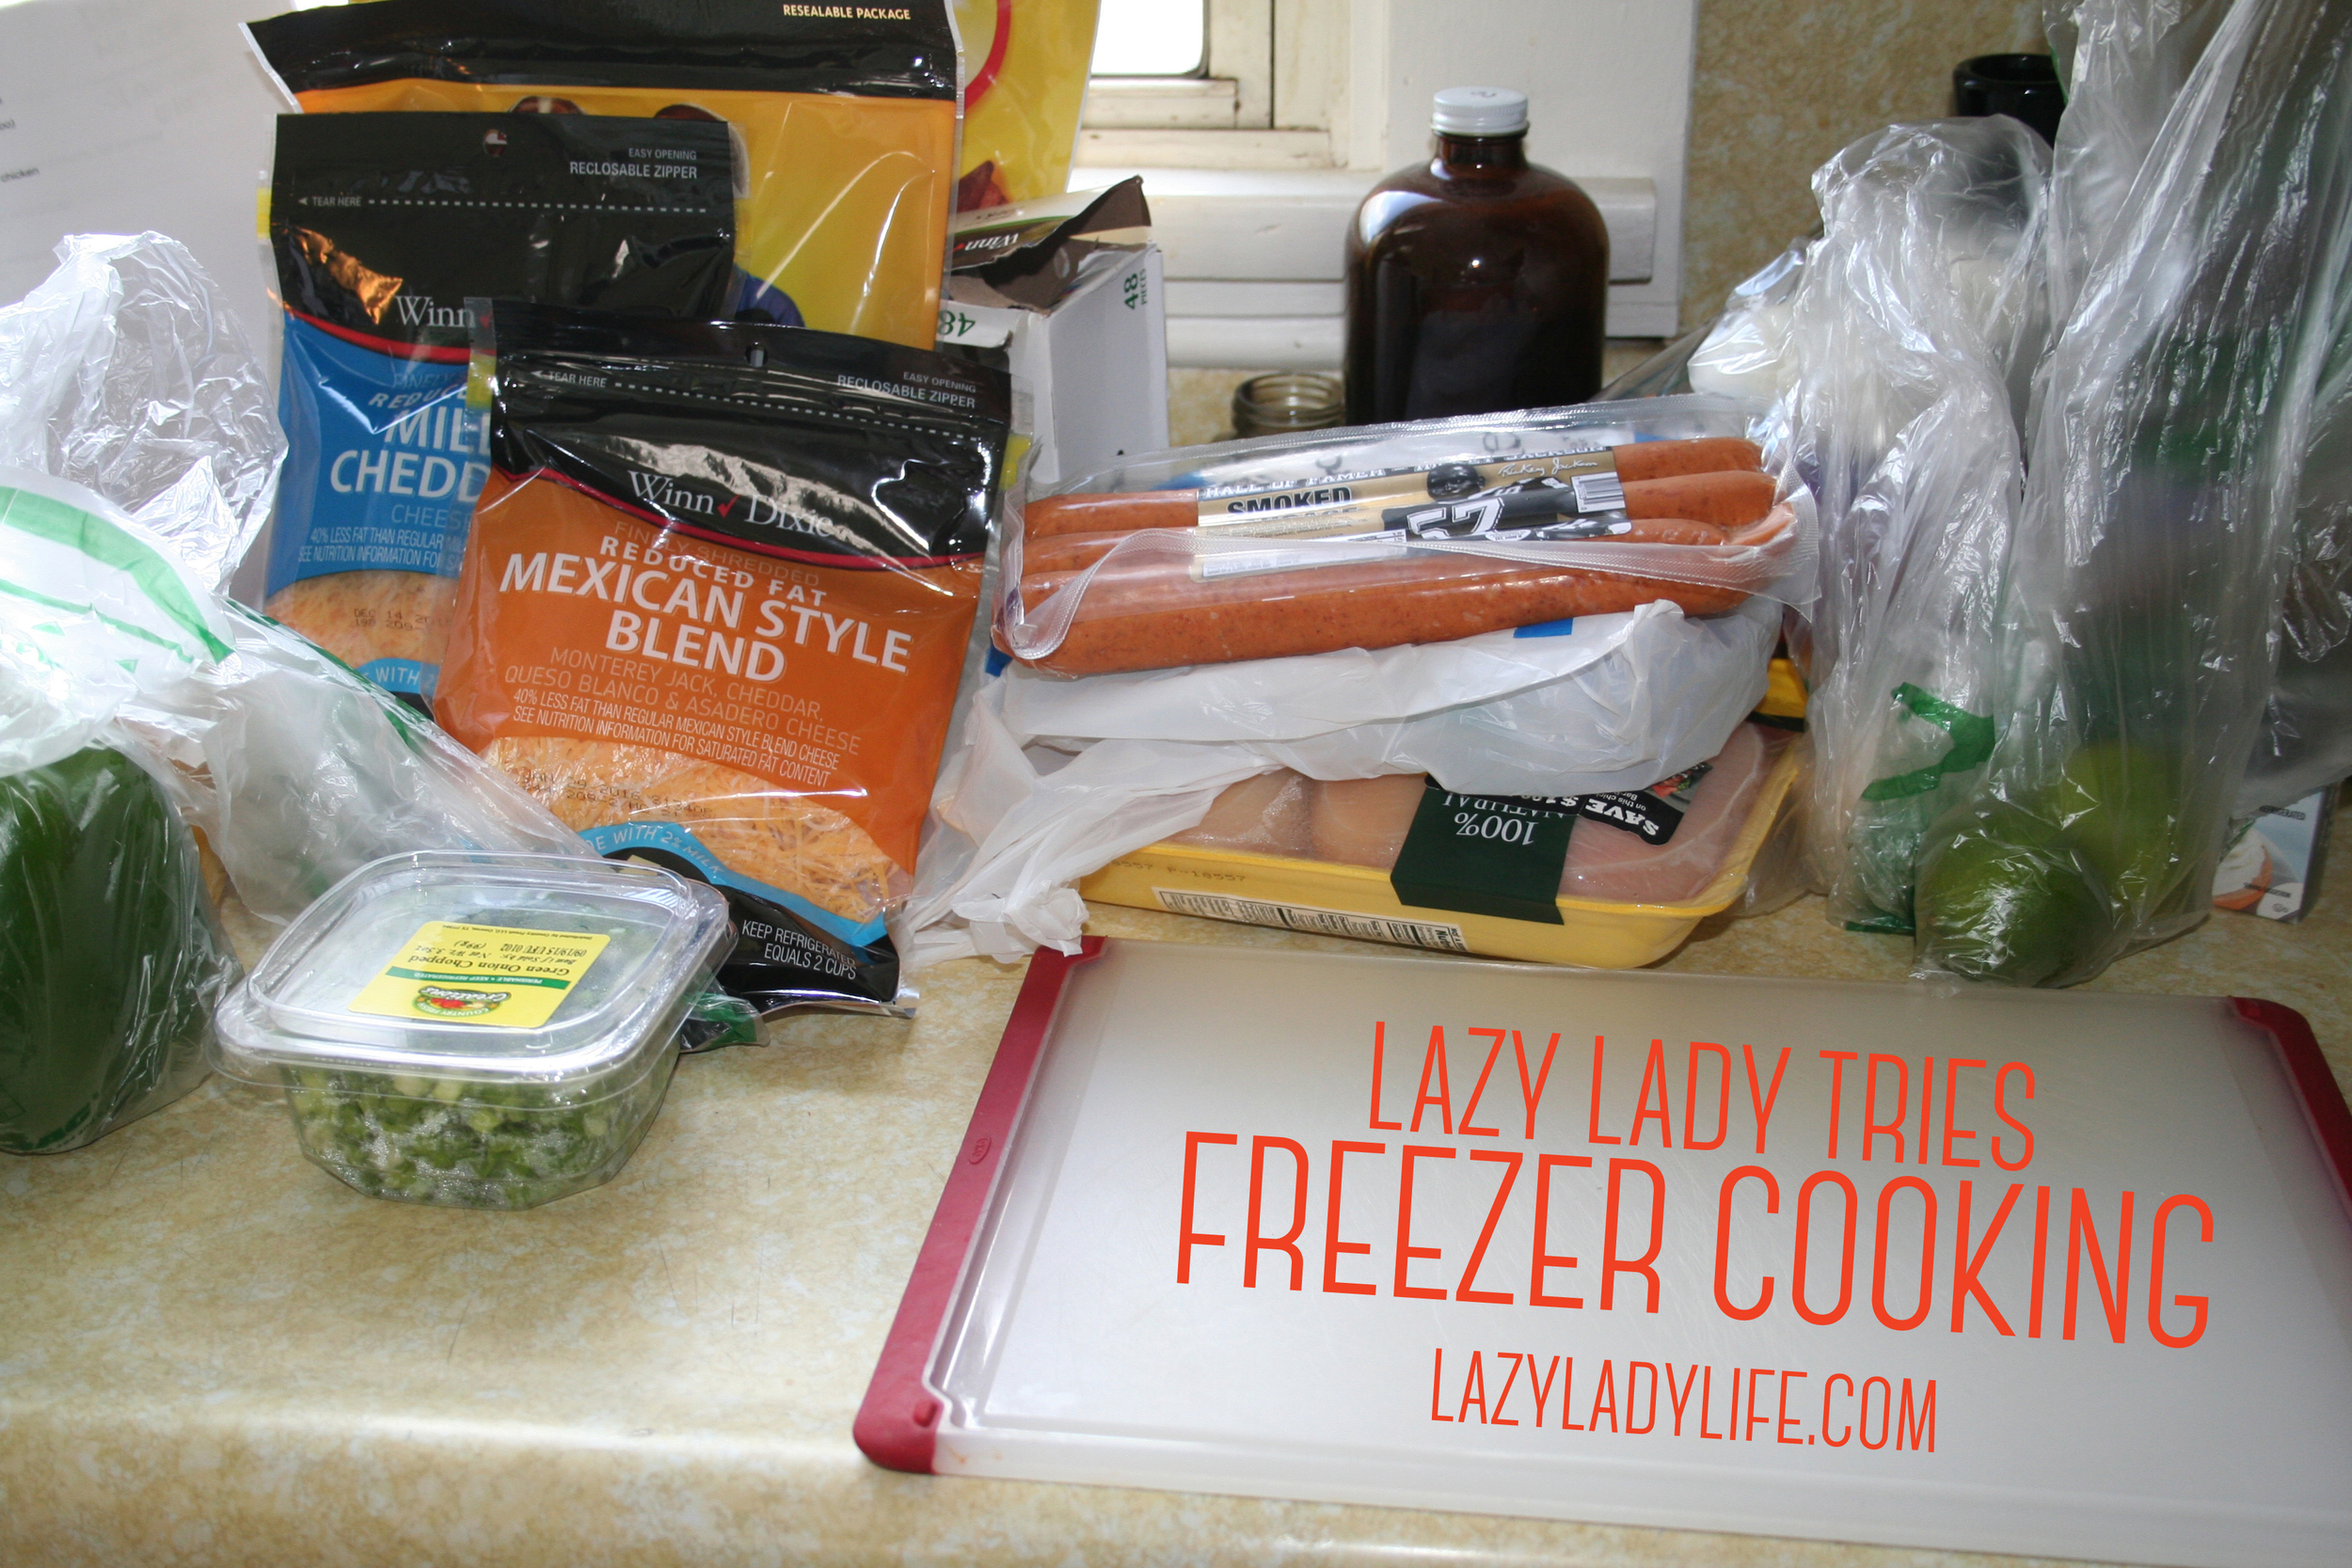 LazyLady-FreezerCooking